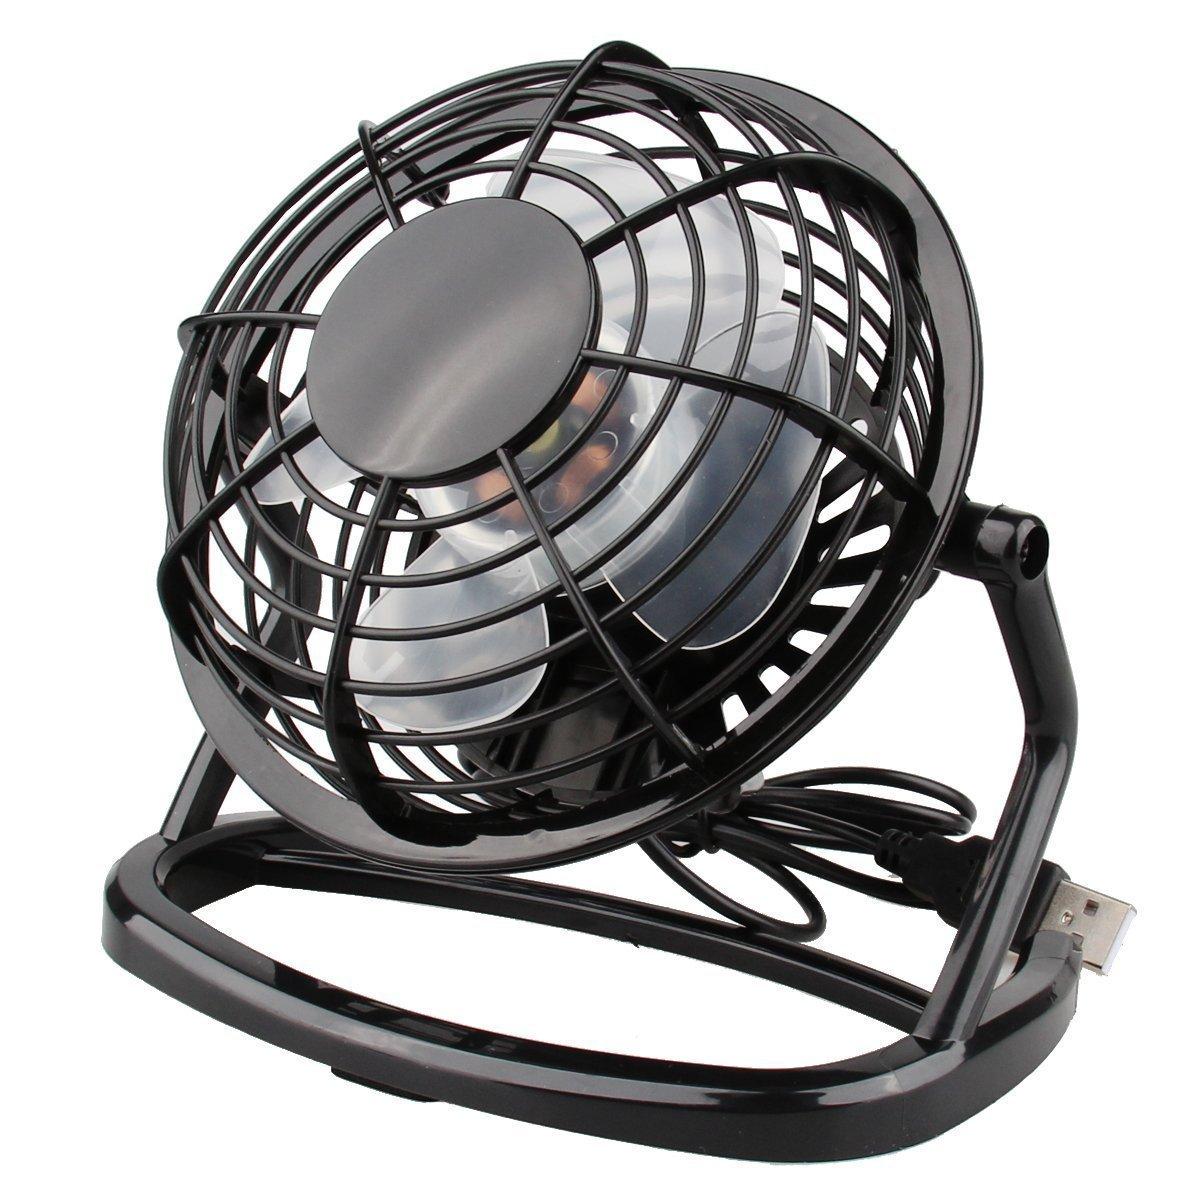 Winmany USB Fan Summer Cooler Cooling Desktop Mini Fan, Mini Super Mute Laptop Computer PC USB Fan Cooler Cooling Desktop Small Fan